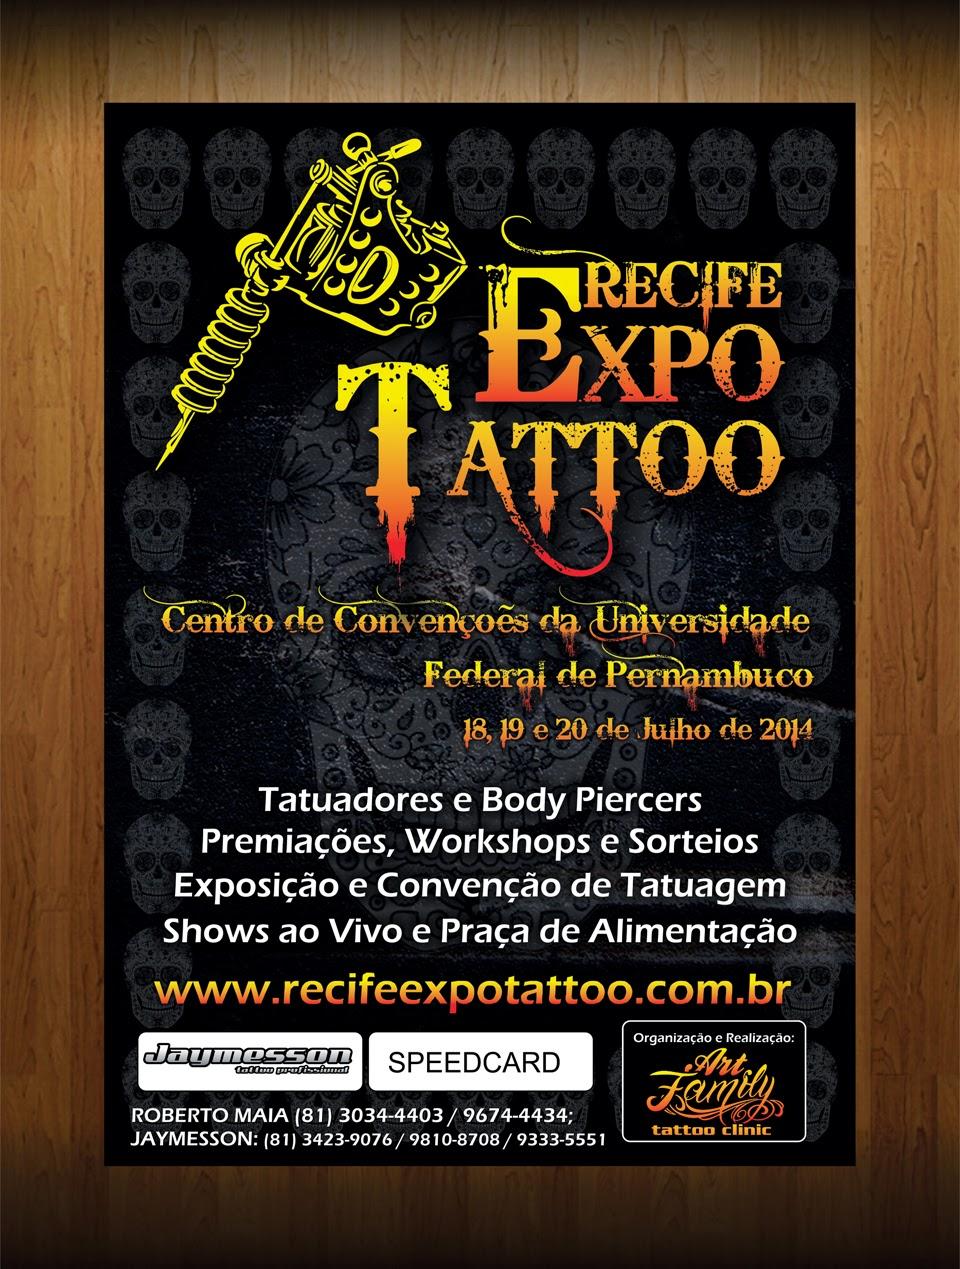 http://www.recifeexpotattoo.com.br/